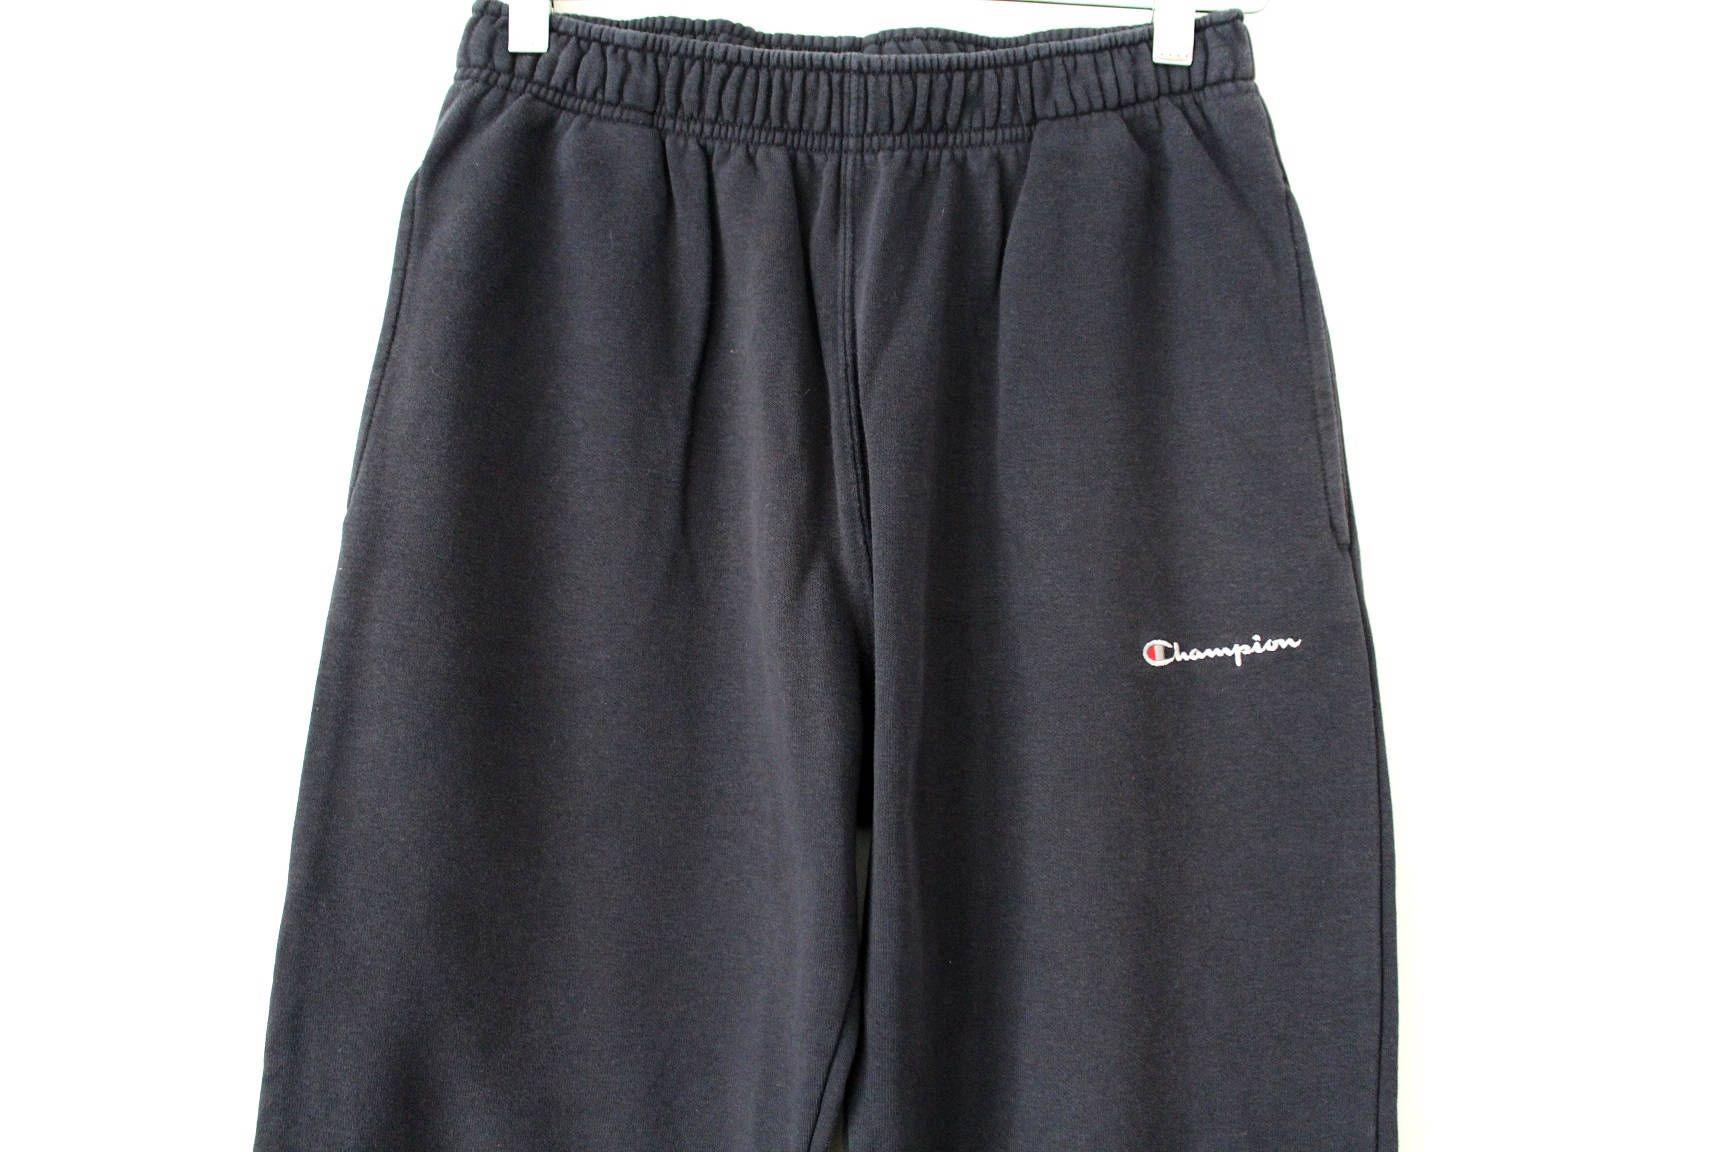 90's Champion Pants Gray Champion Sport Pants Rare Champion